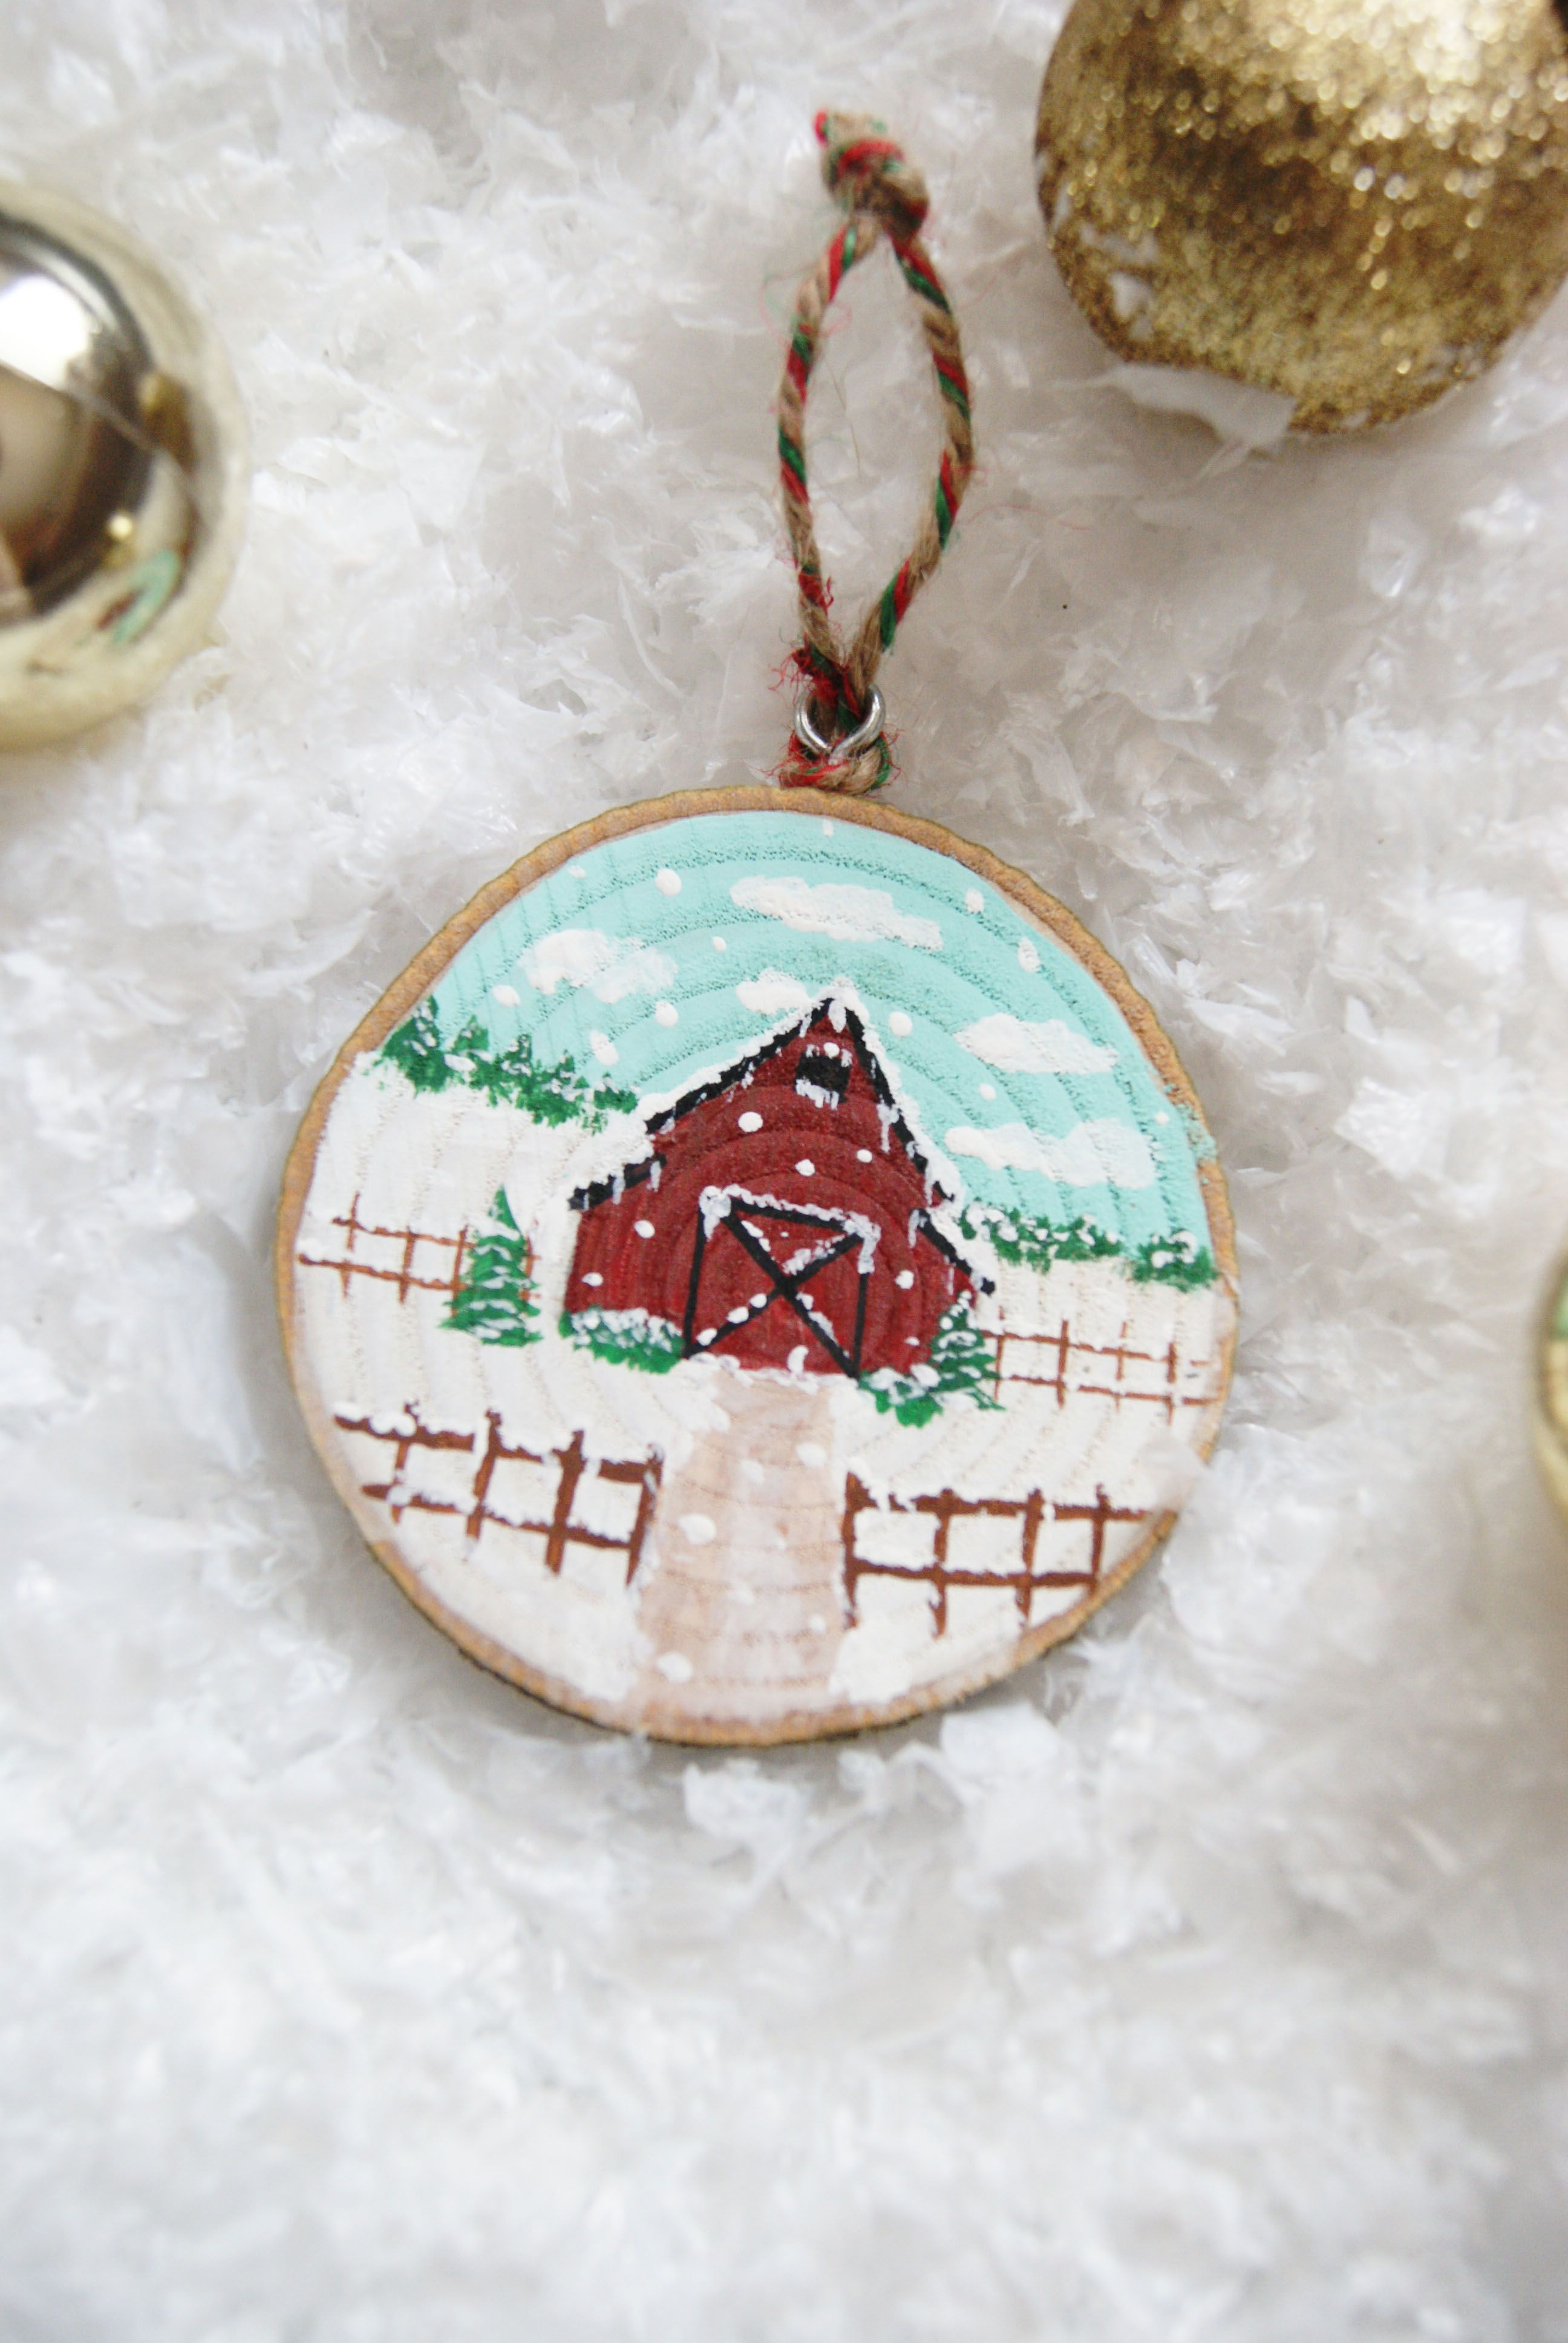 Barn Ornament Christmas Barn Wooden Ornament Painted Barn Etsy Christmas Ornaments Painted Christmas Ornaments Wood Christmas Ornaments